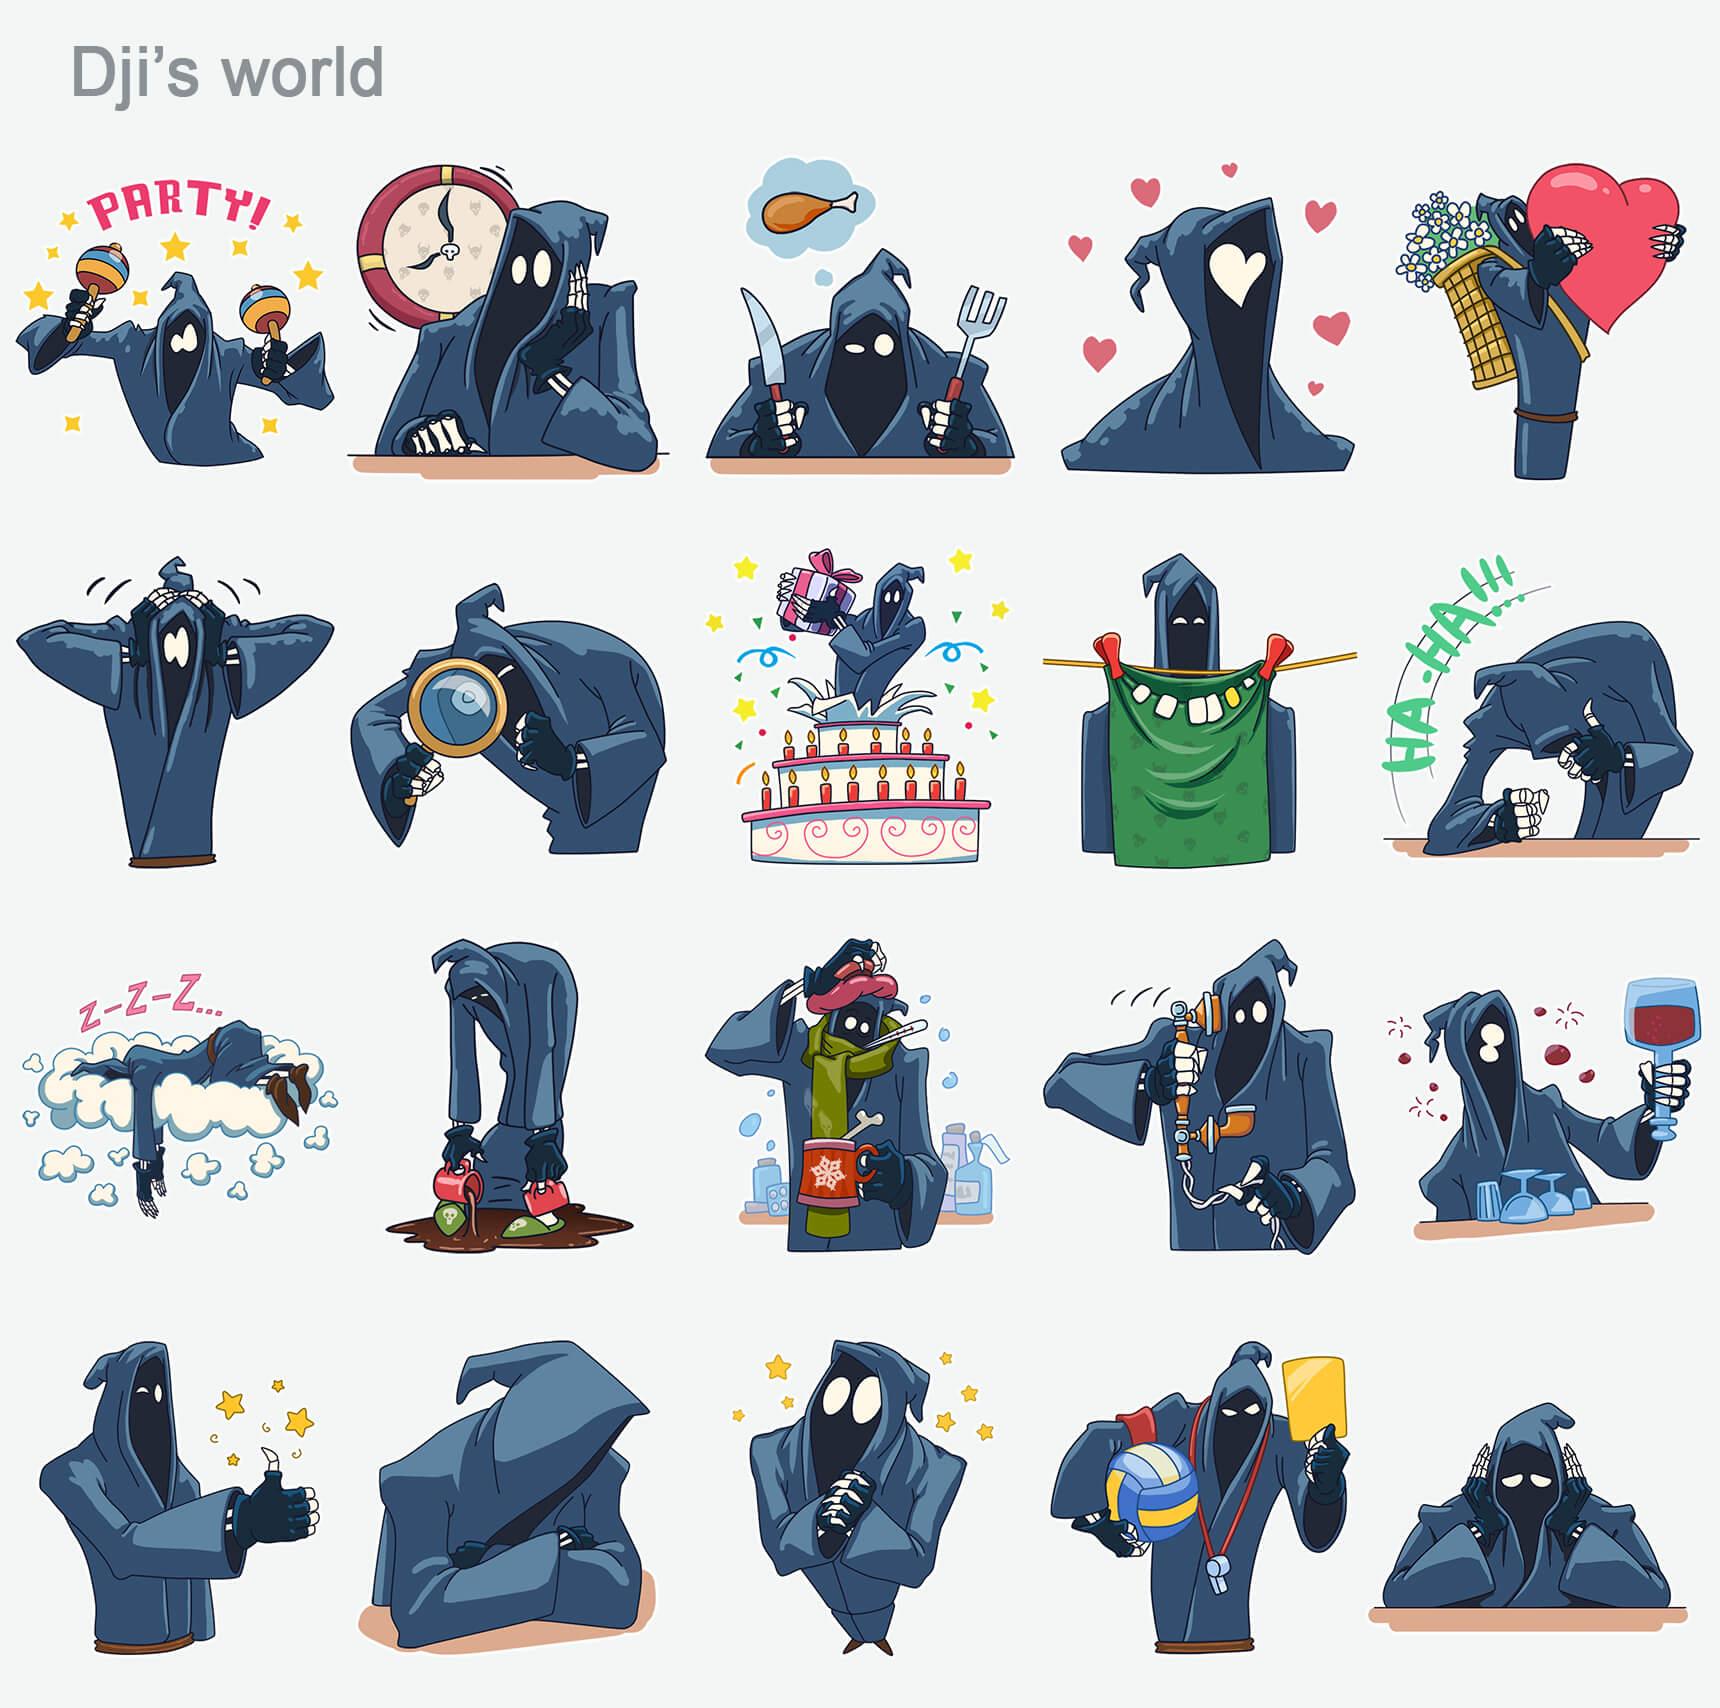 Dji's-world (1)